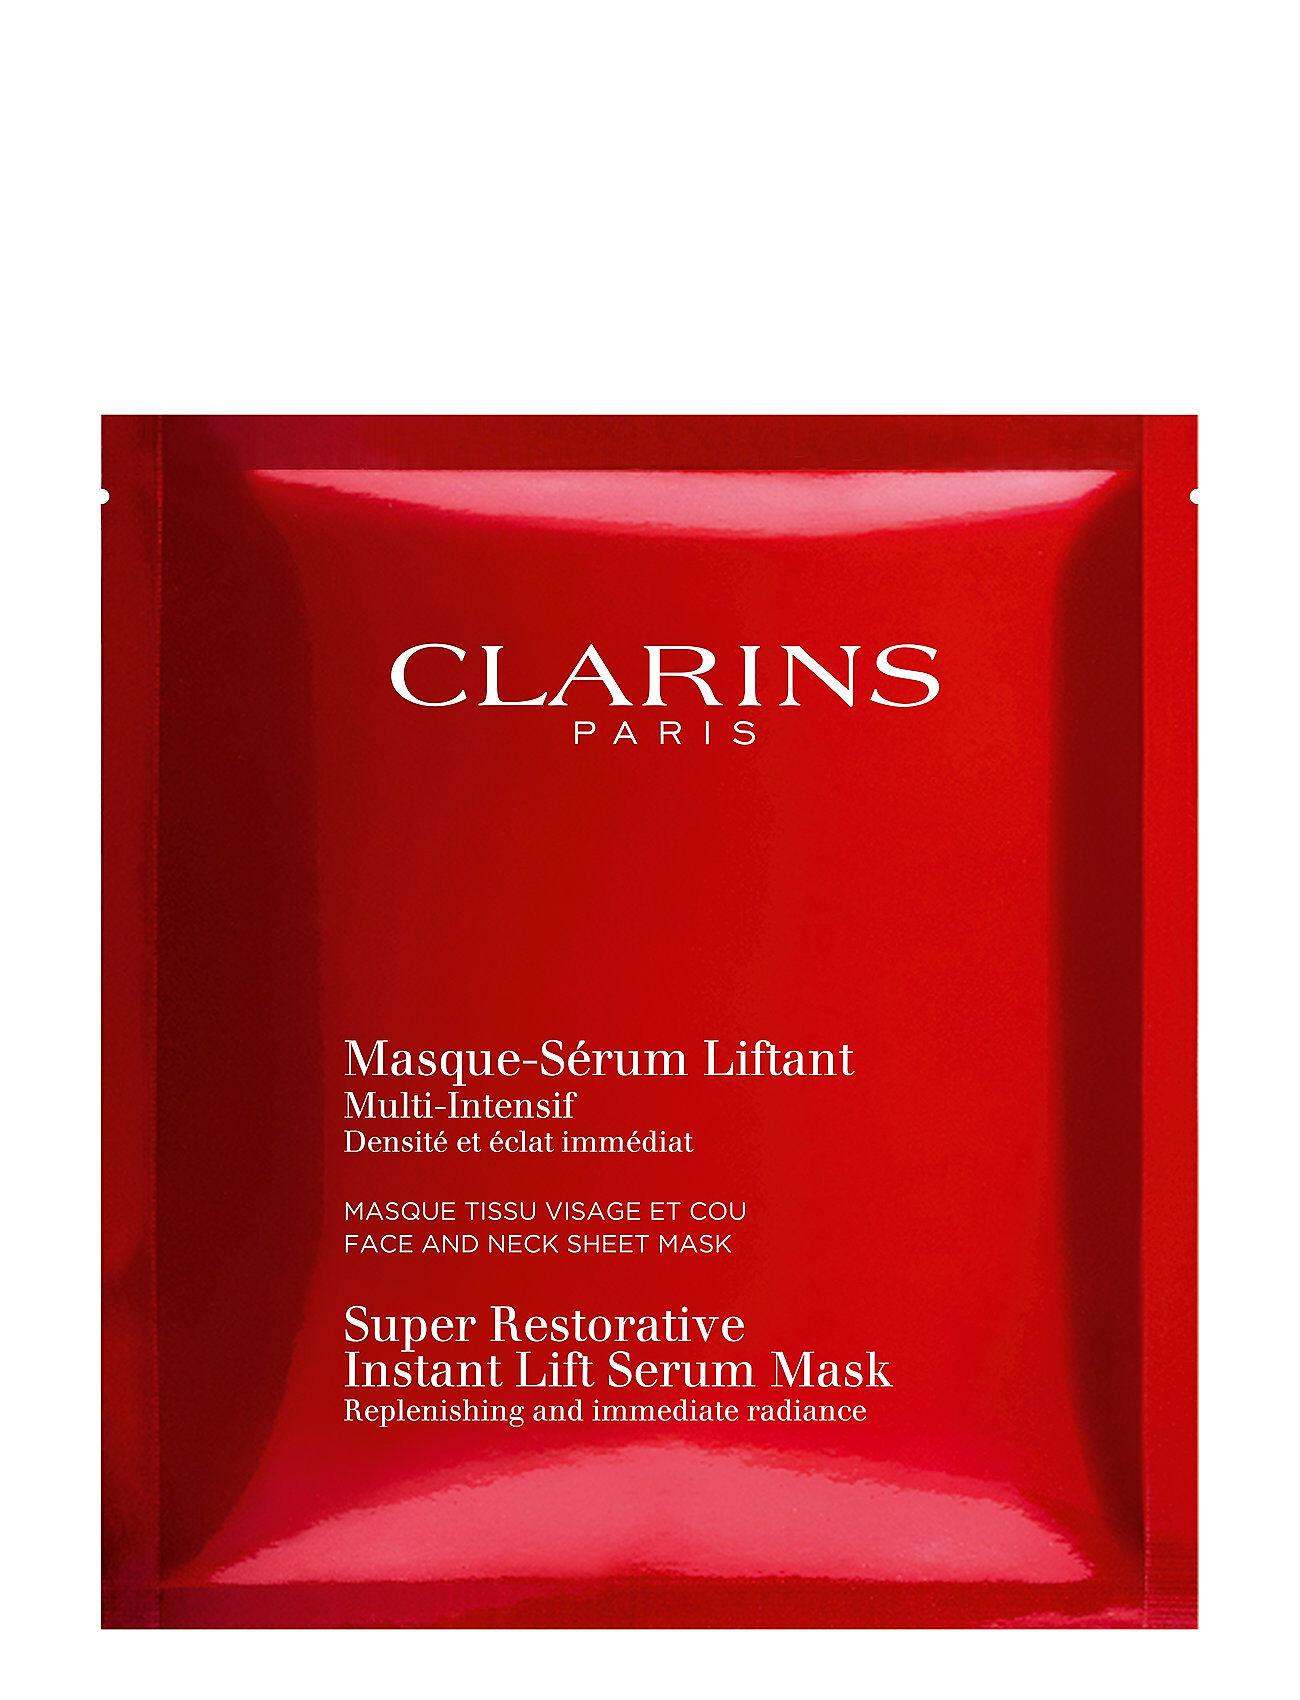 Clarins Super Restorative Instant Lift Mask 1 Pcs Kasvojen Ihonhoito Clarins